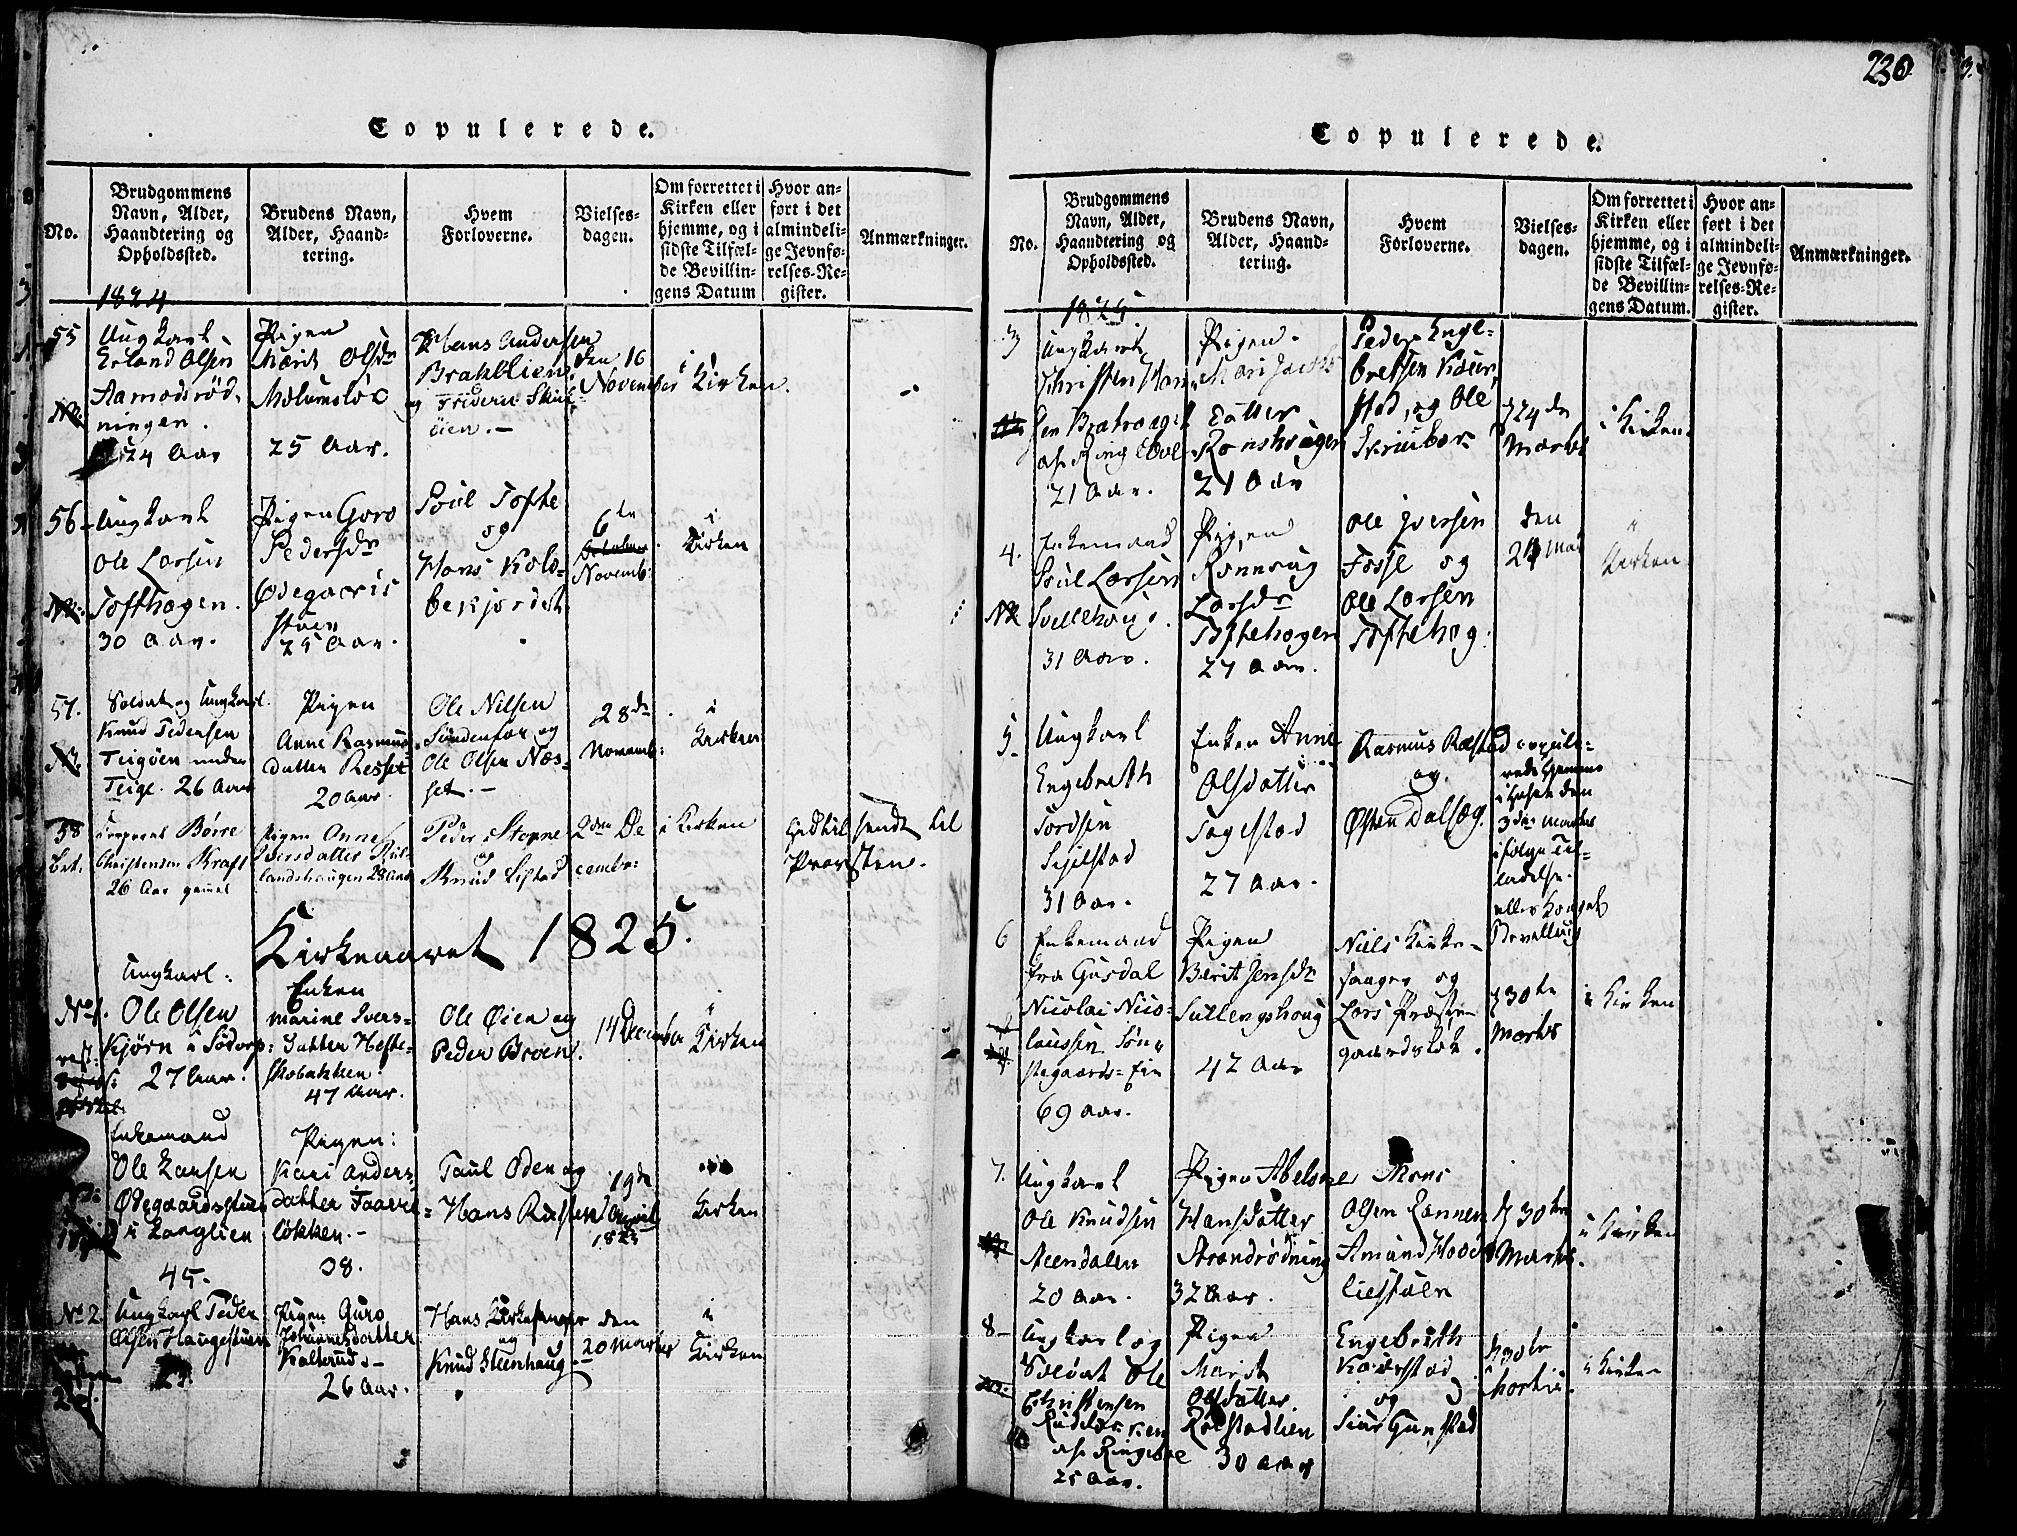 SAH, Fron prestekontor, H/Ha/Haa/L0002: Ministerialbok nr. 2, 1816-1827, s. 230